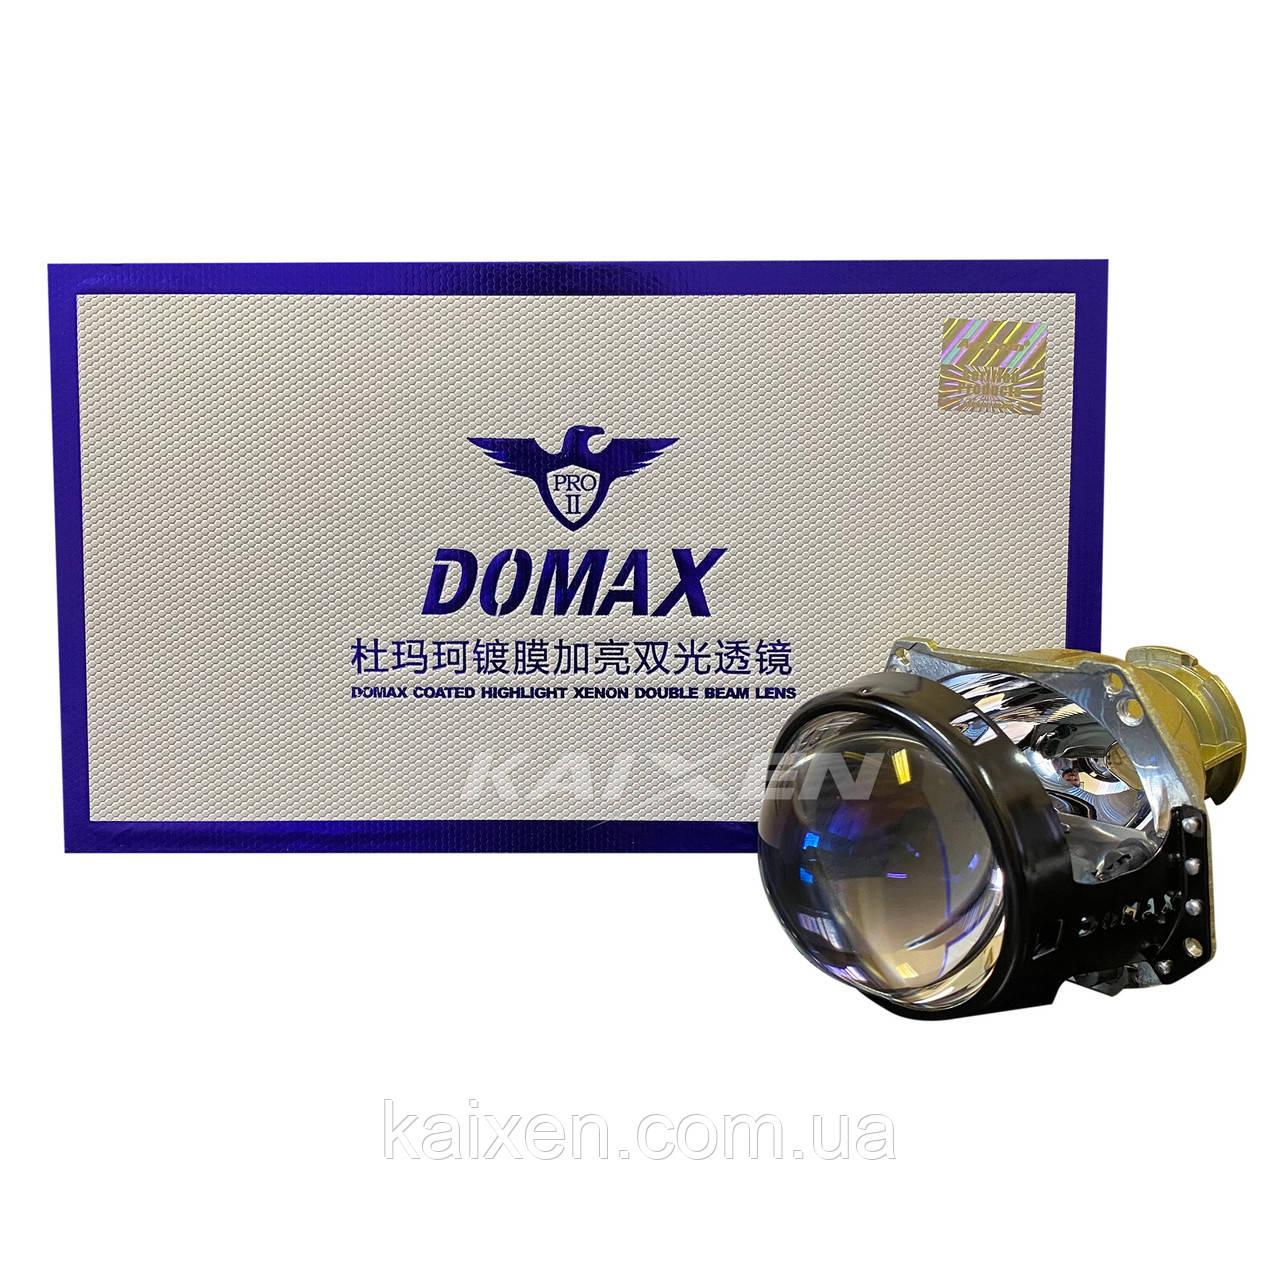 Би-ксеноновые линзы Domax KING